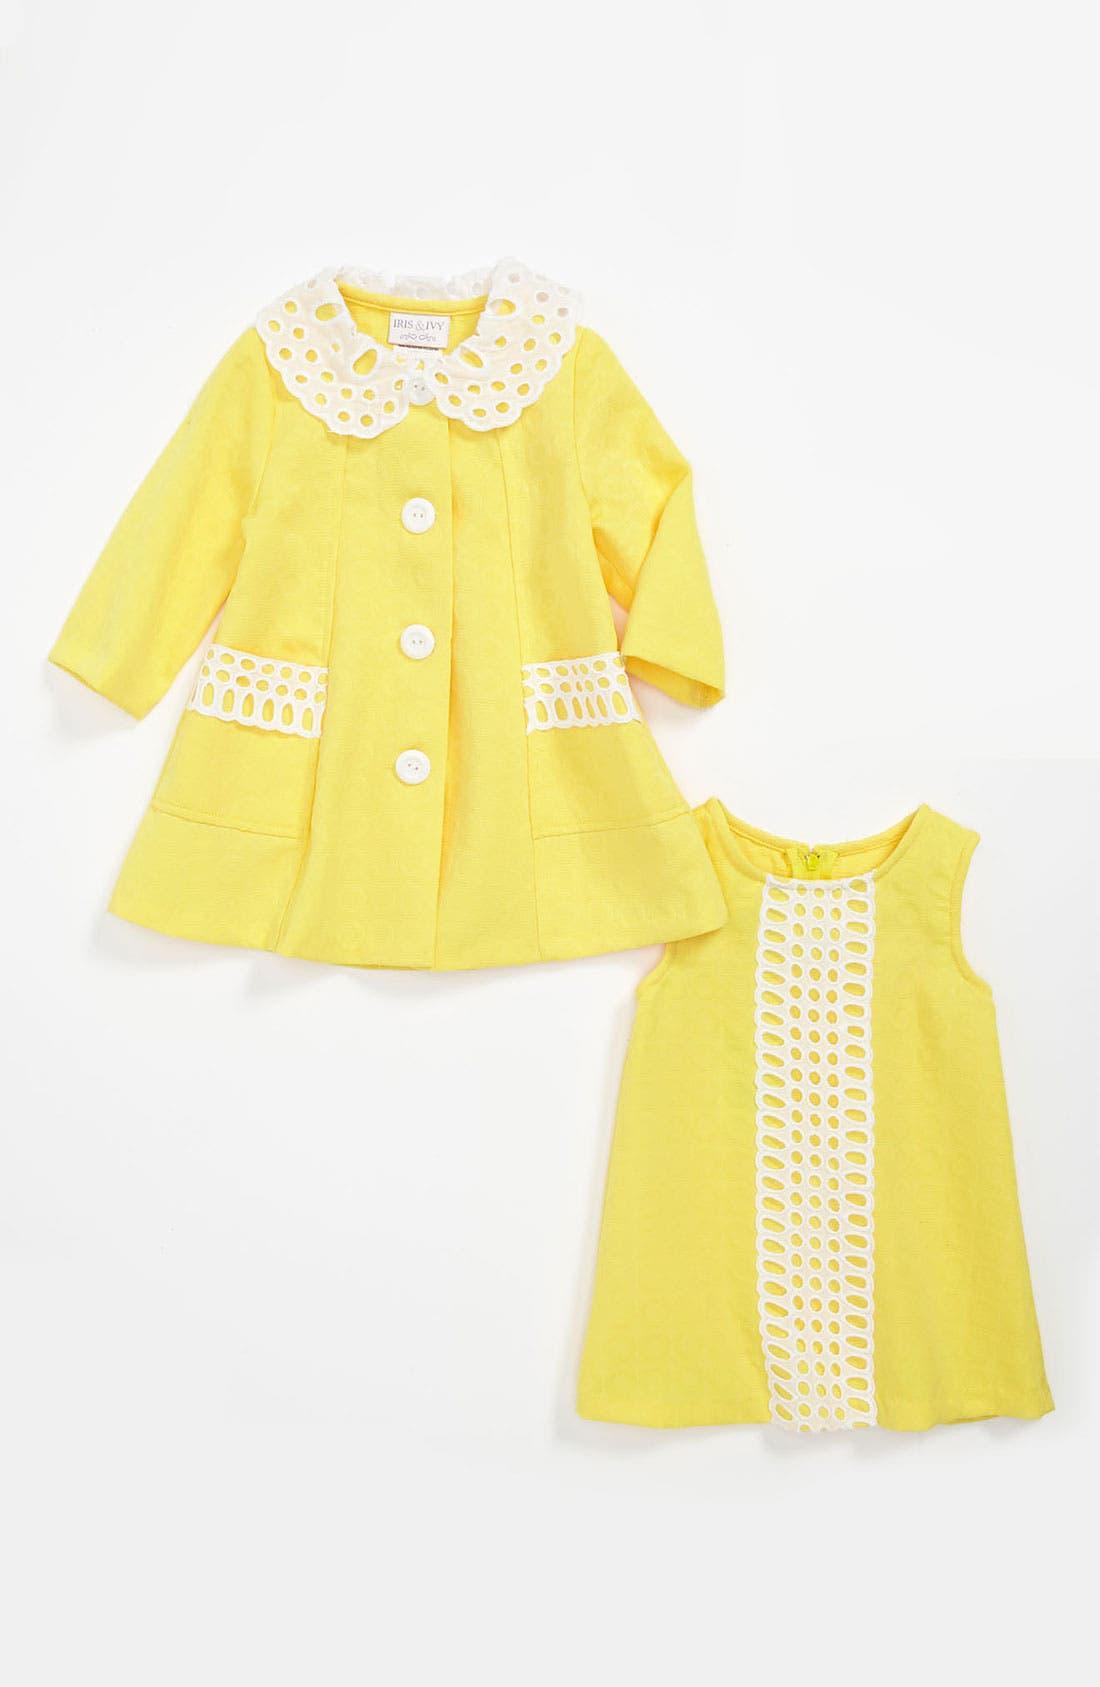 Alternate Image 1 Selected - Iris & Ivy Shift Dress & Jacket (Toddler)